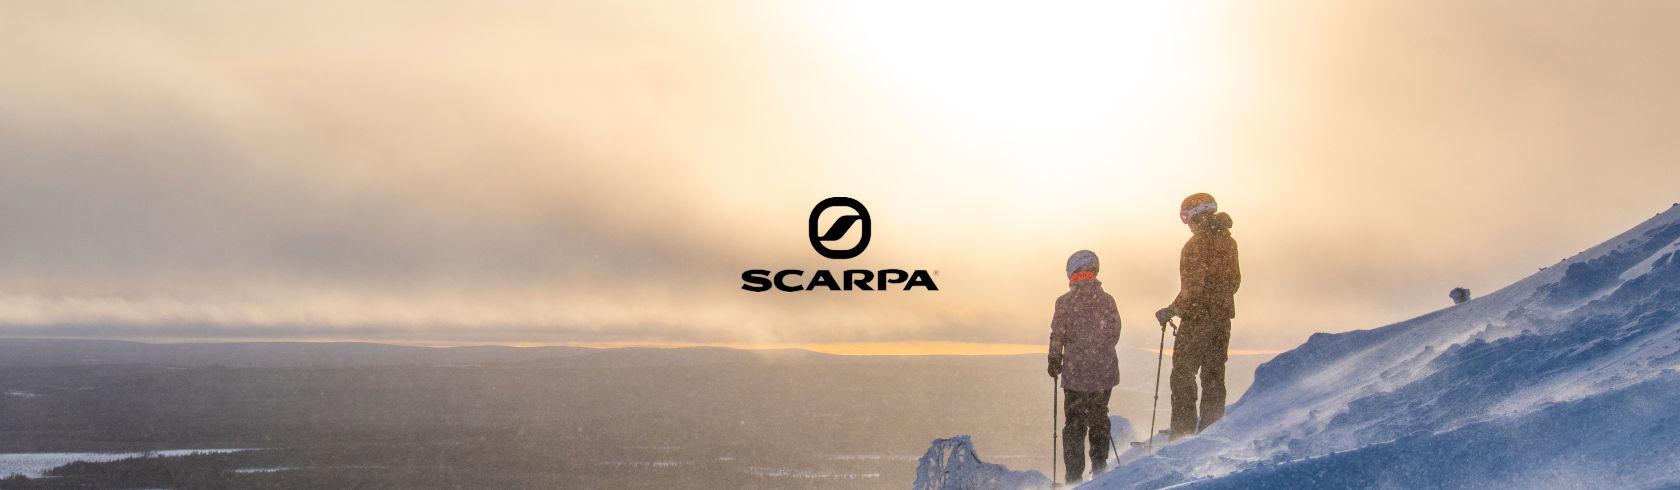 Scarpa brand logo